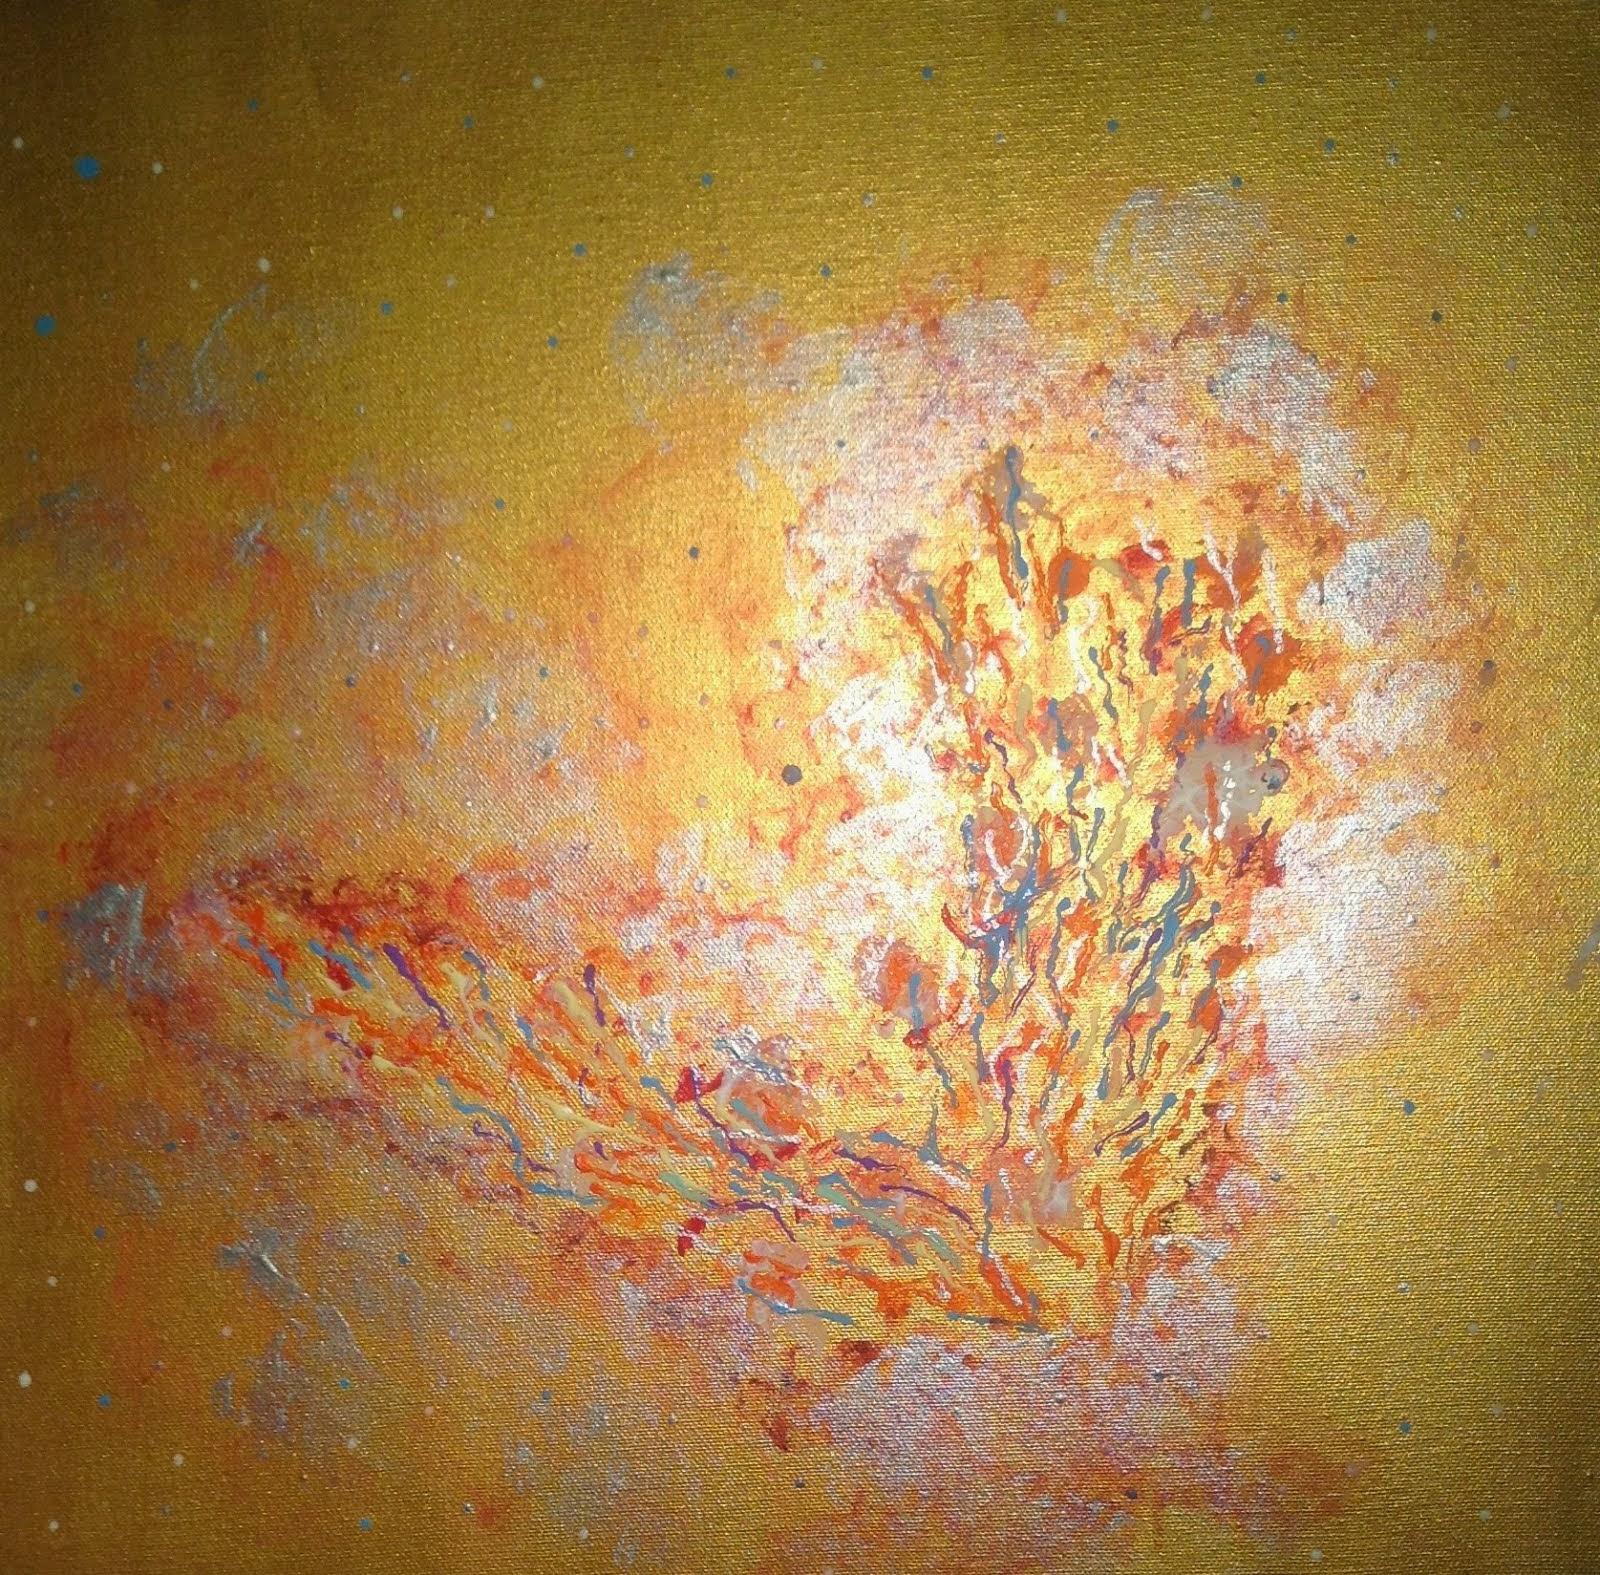 Cosmic Ikon 8 Moth